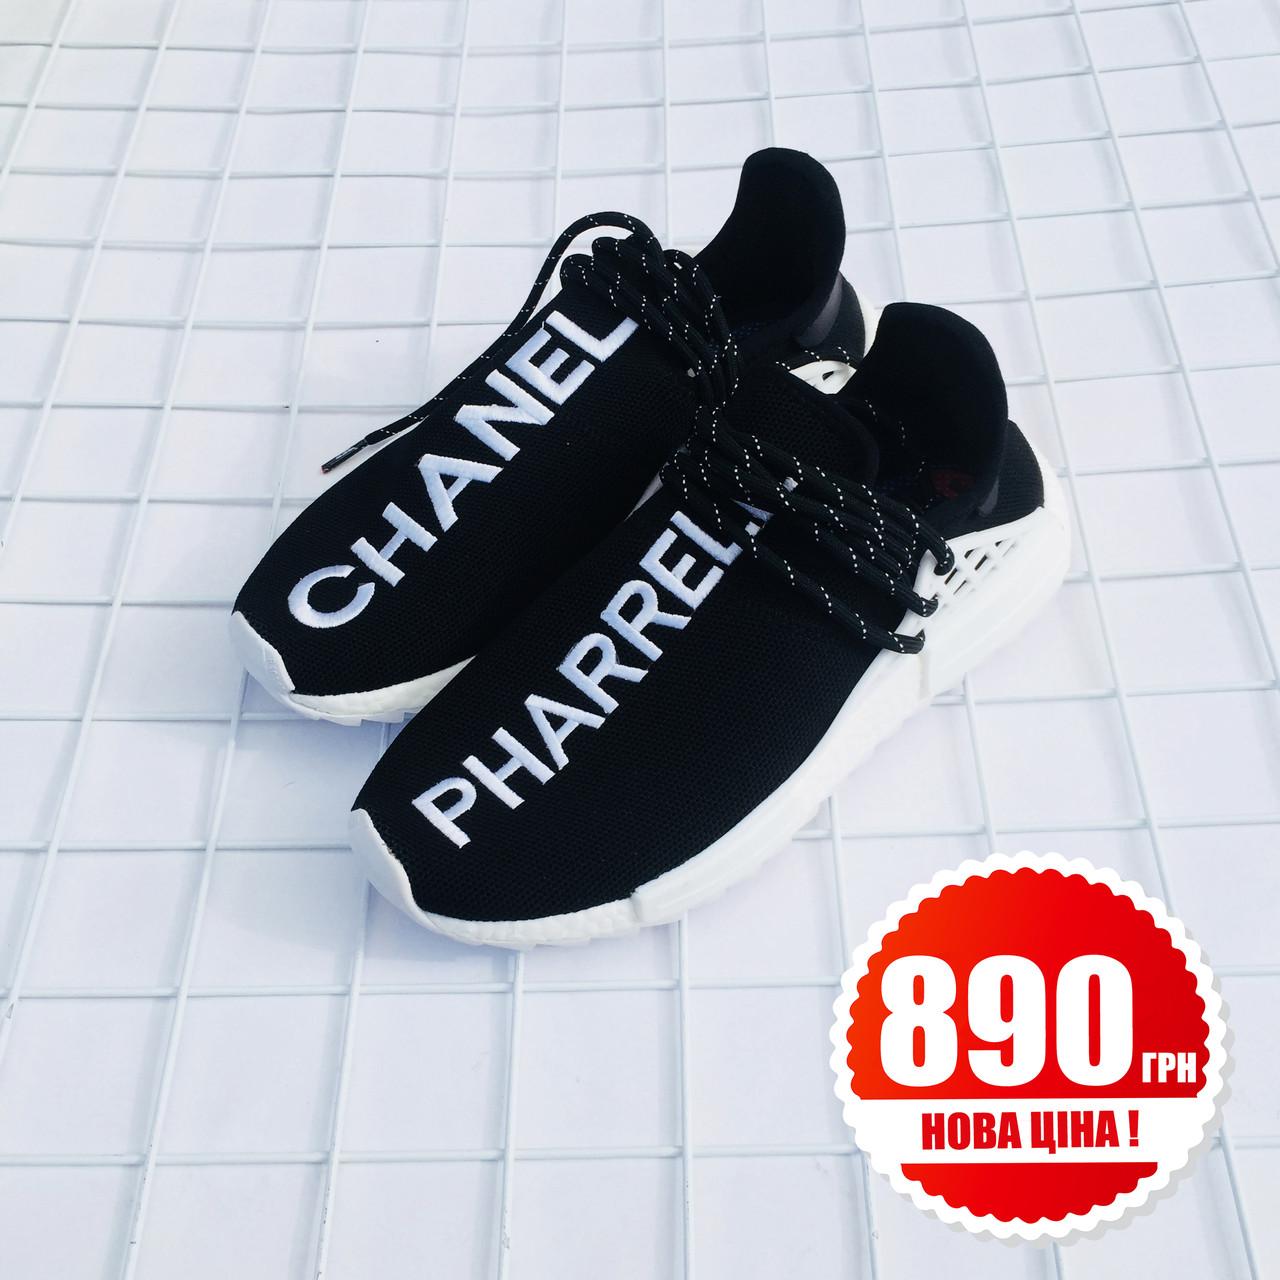 ff1542f8325e Adidas Chanel x adidas Originals Pharrell Williams Hu NMD - Піратська  Республіка в Львове